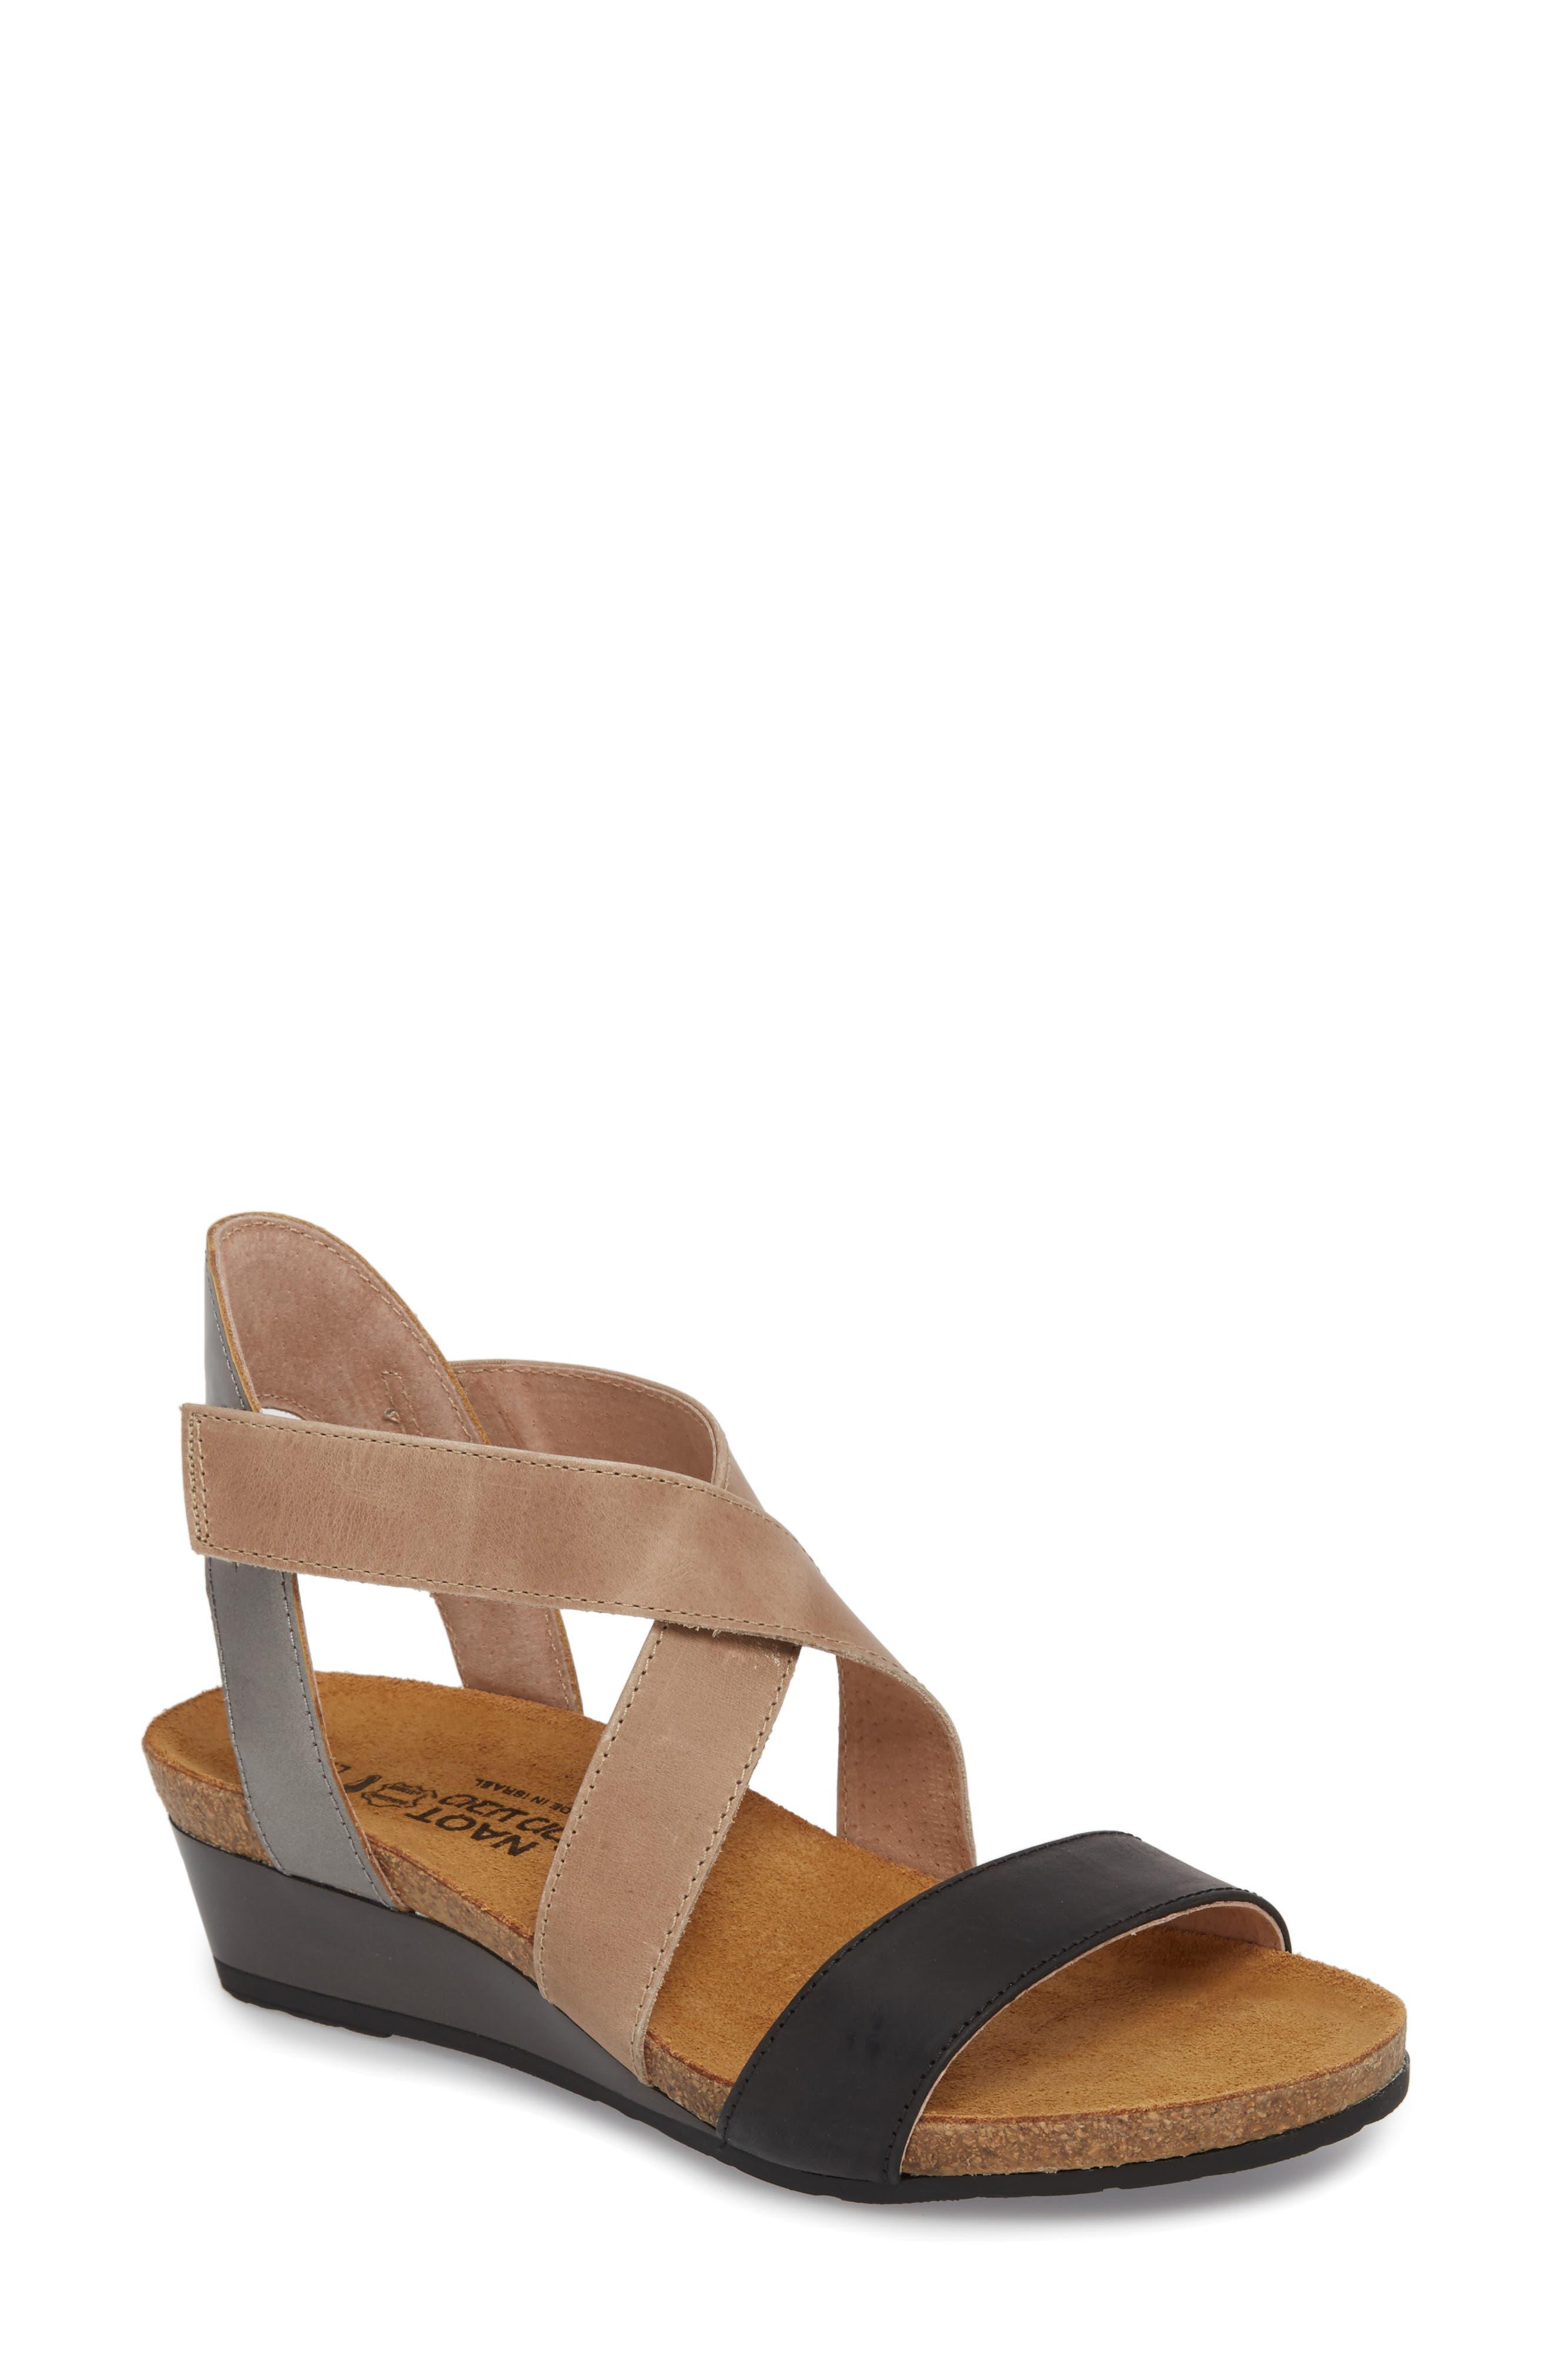 NAOT Vixen Wedge Sandal, Main, color, OILY COAL LEATHER